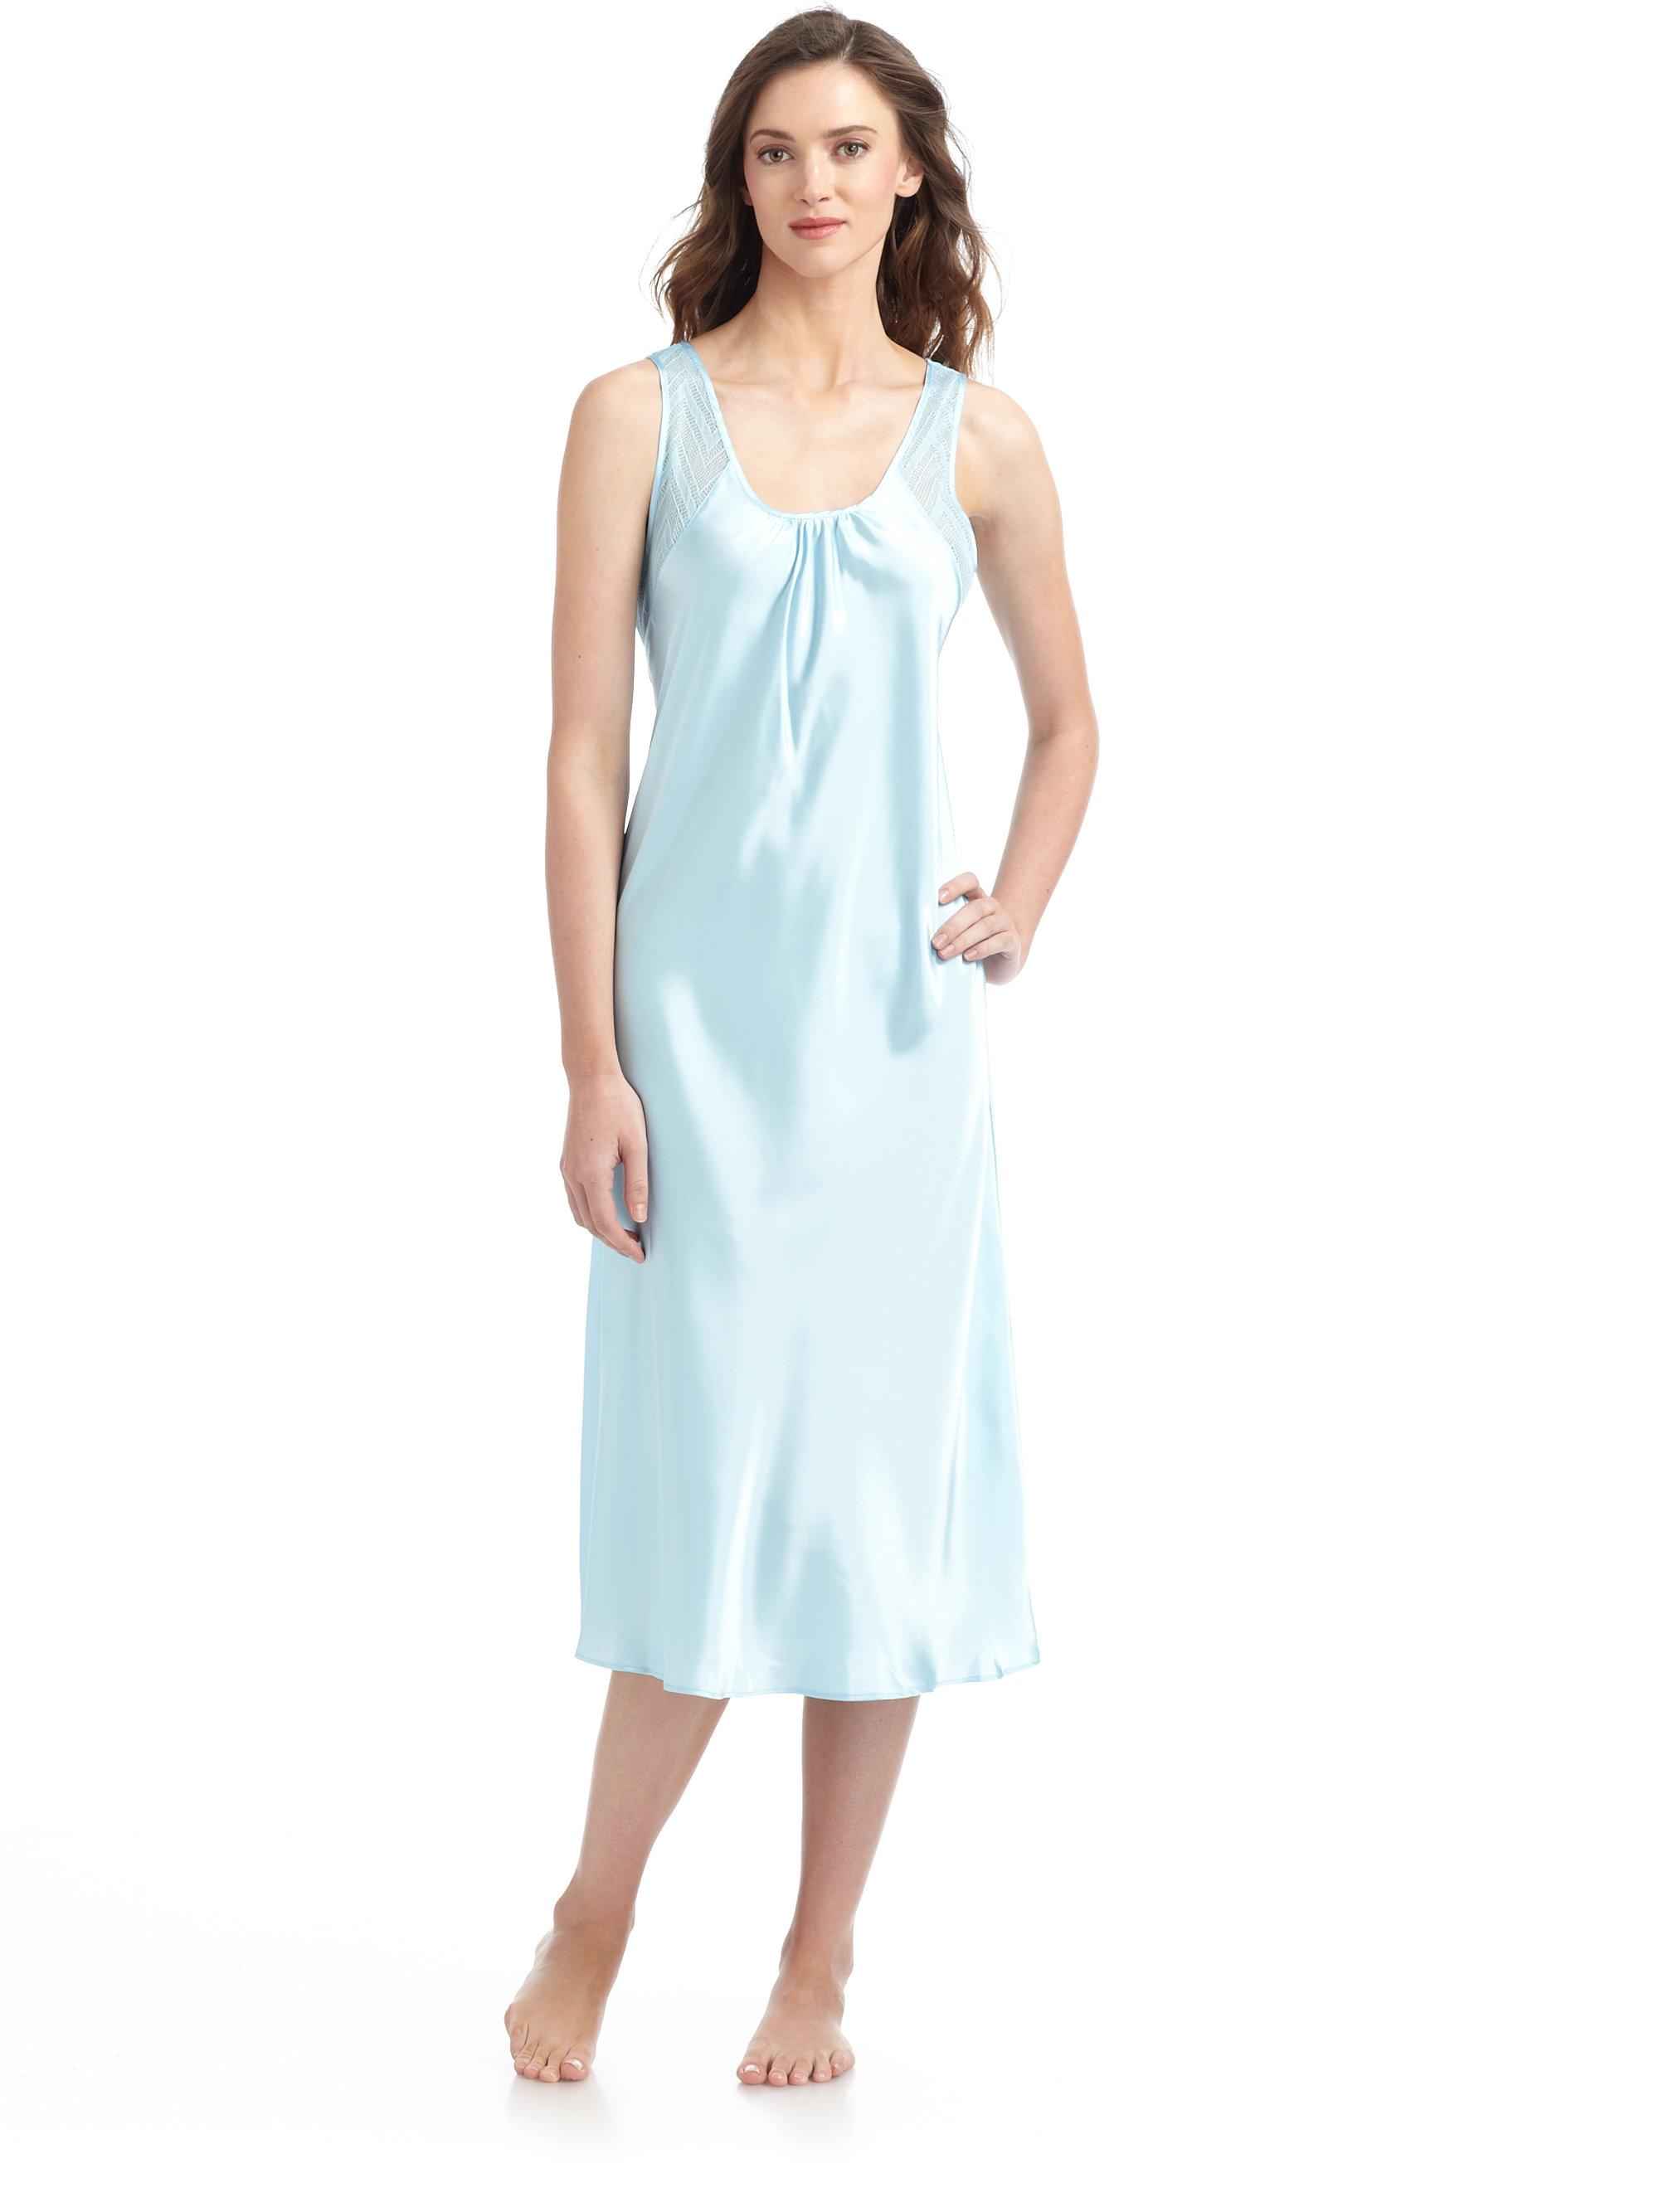 oscar de la renta breezy morning lace inset nightgown in. Black Bedroom Furniture Sets. Home Design Ideas